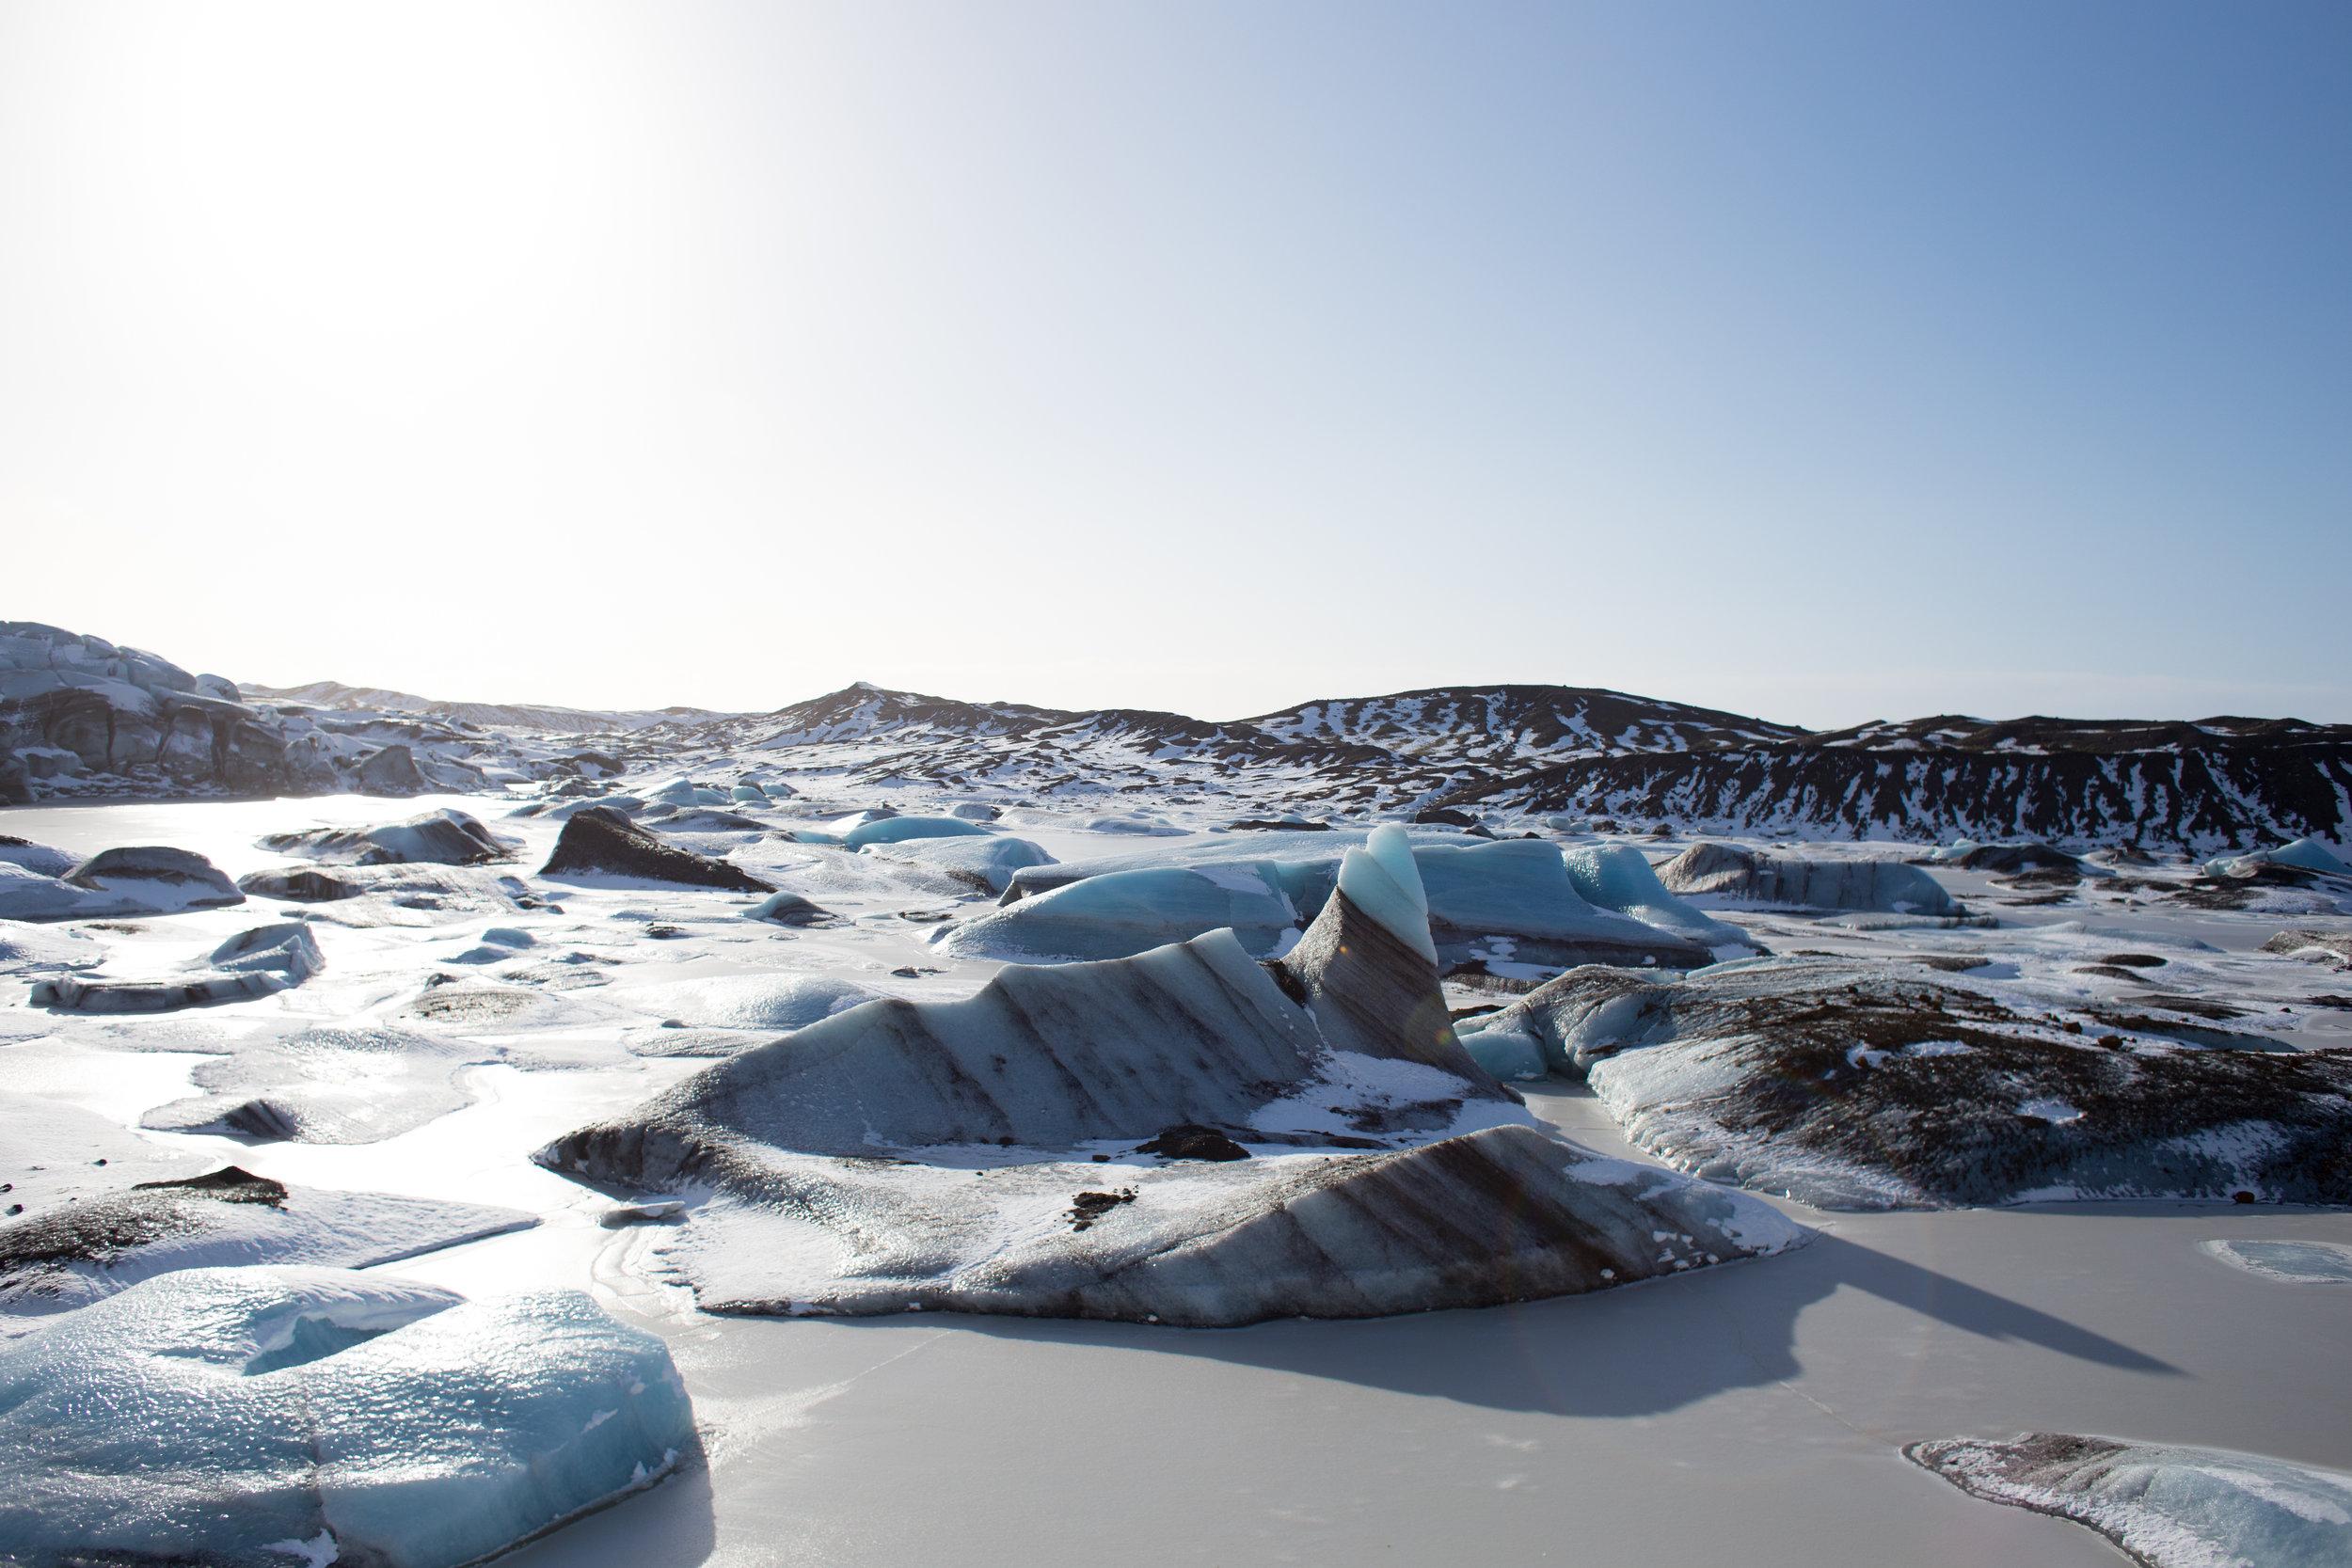 jermiah-schuster-iceland-427.jpg